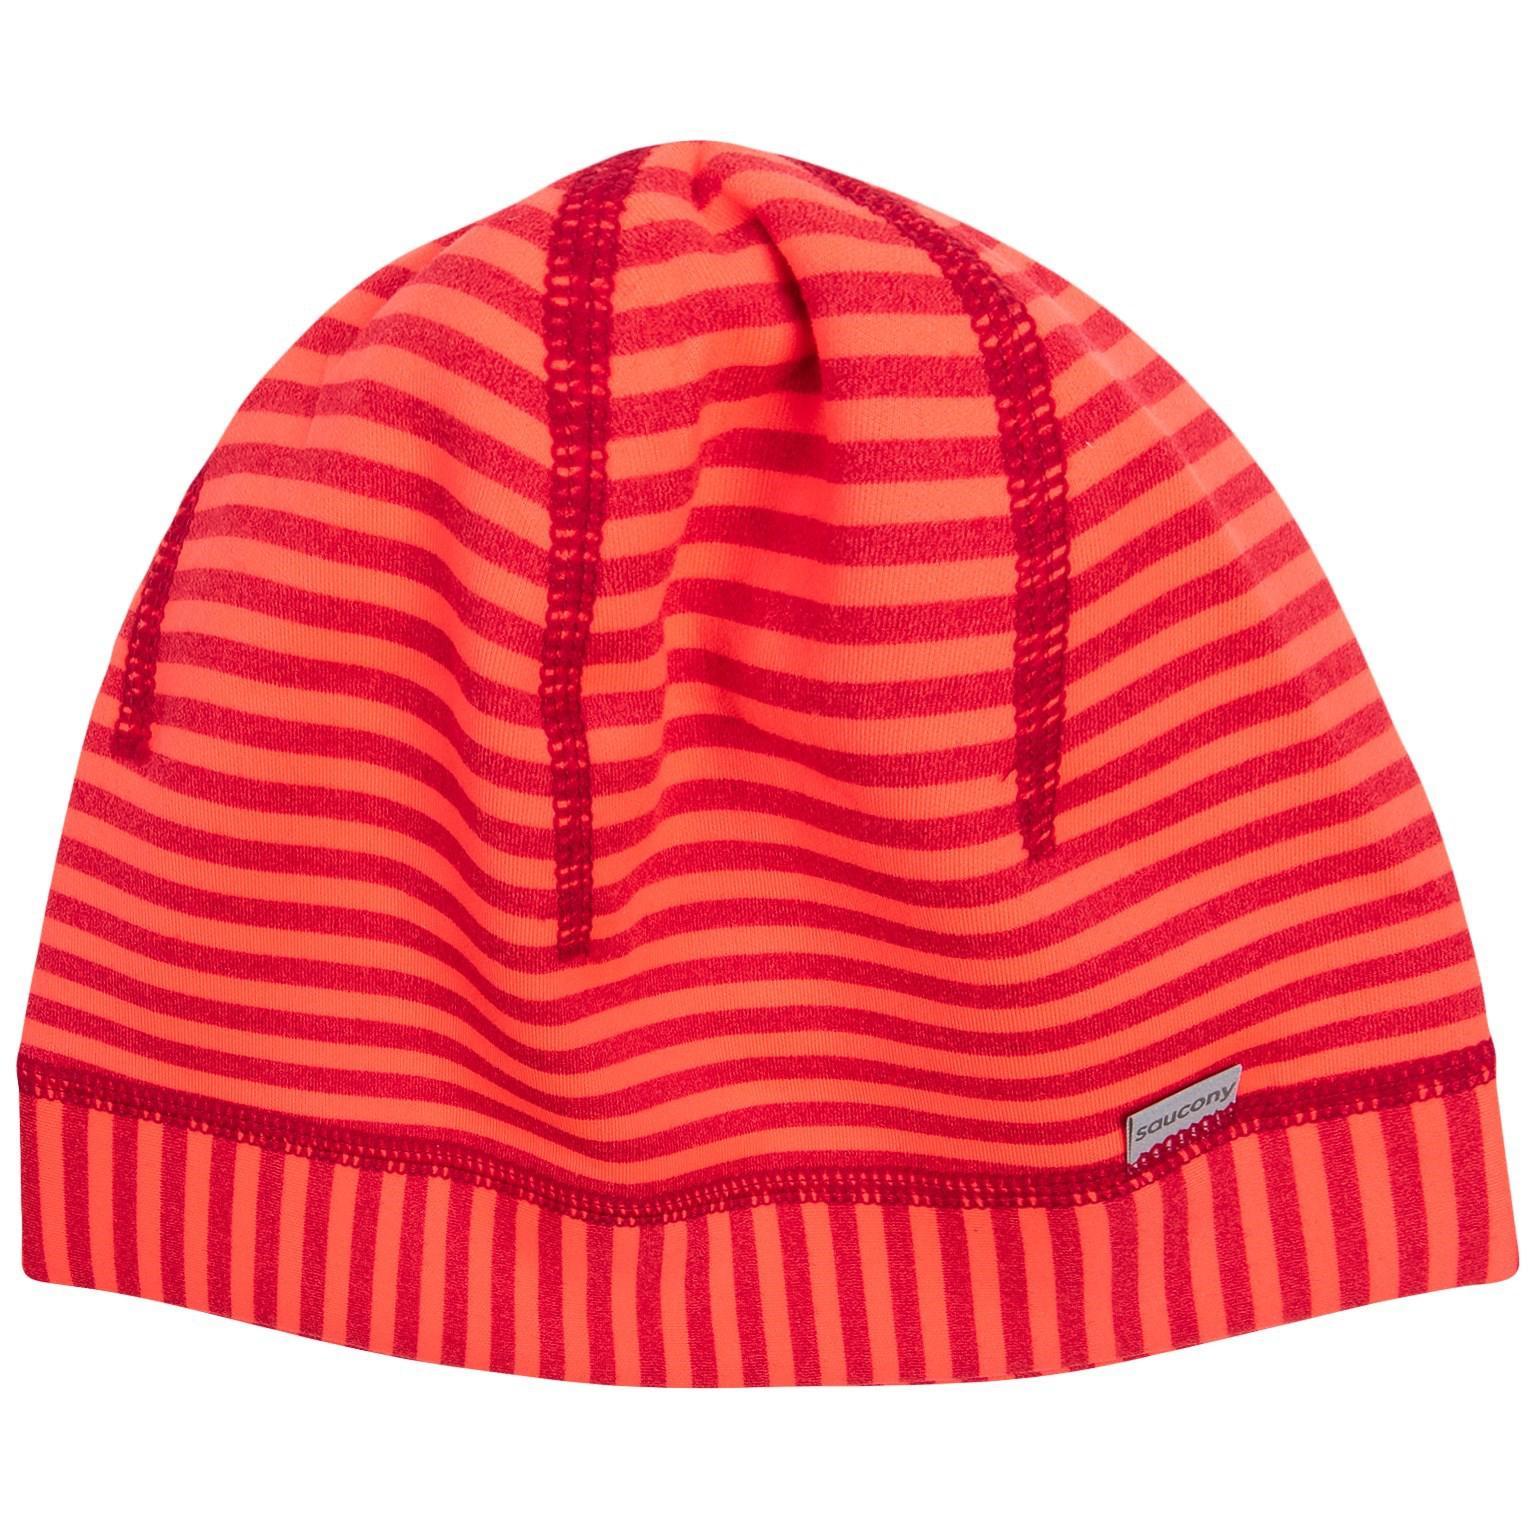 Lyst - Saucony Brisk Skull Cap Hat in Red 33e62b99aefd